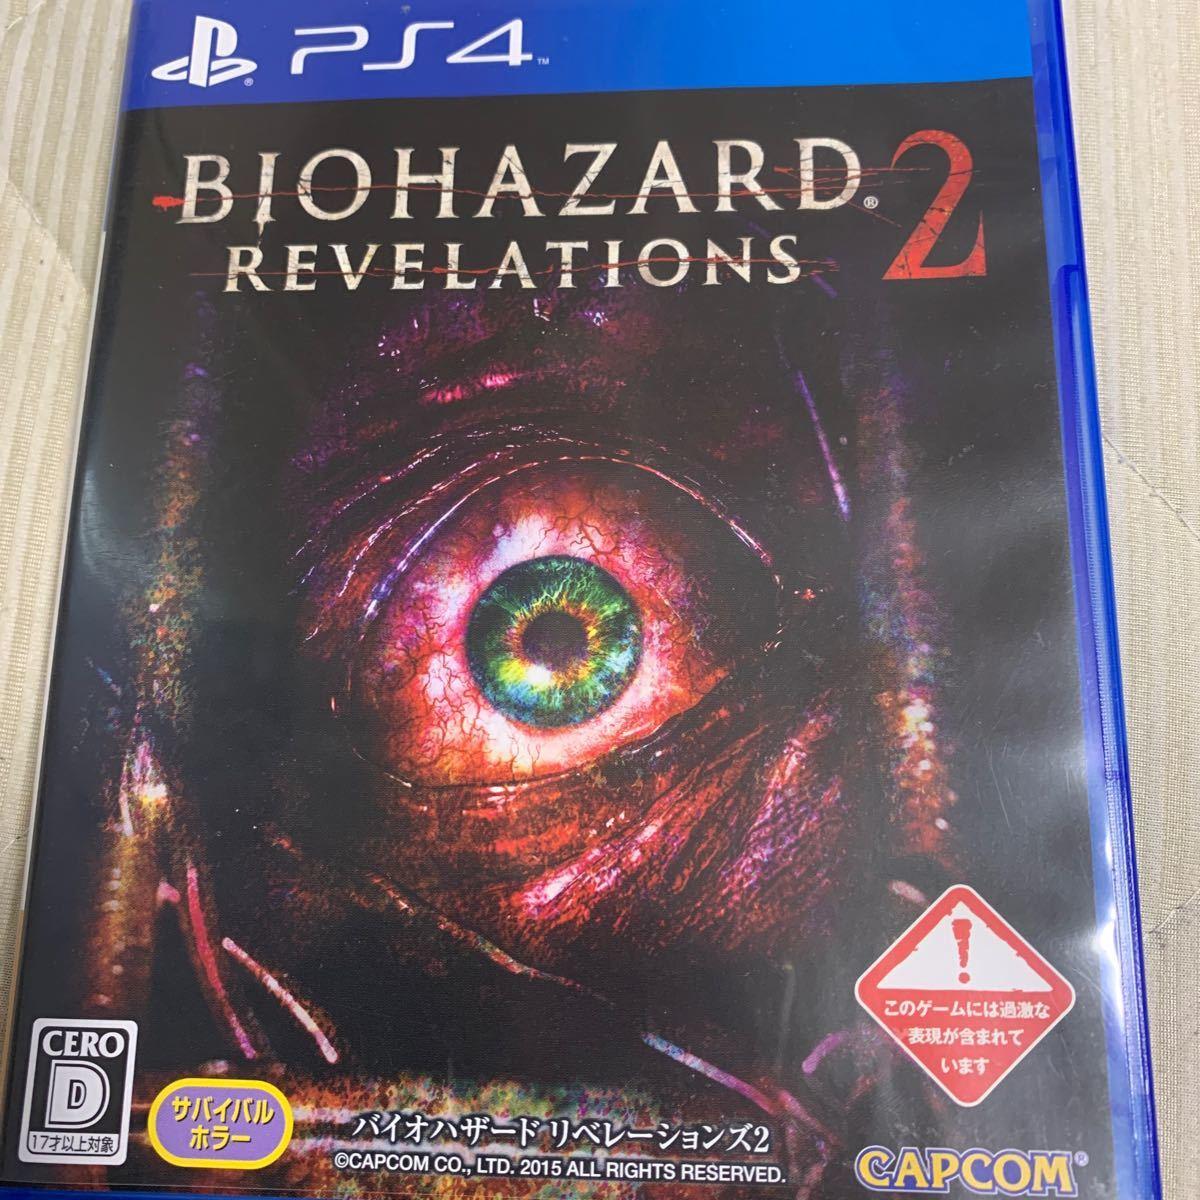 【PS4】 バイオハザード リべレーションズ2 [通常版]